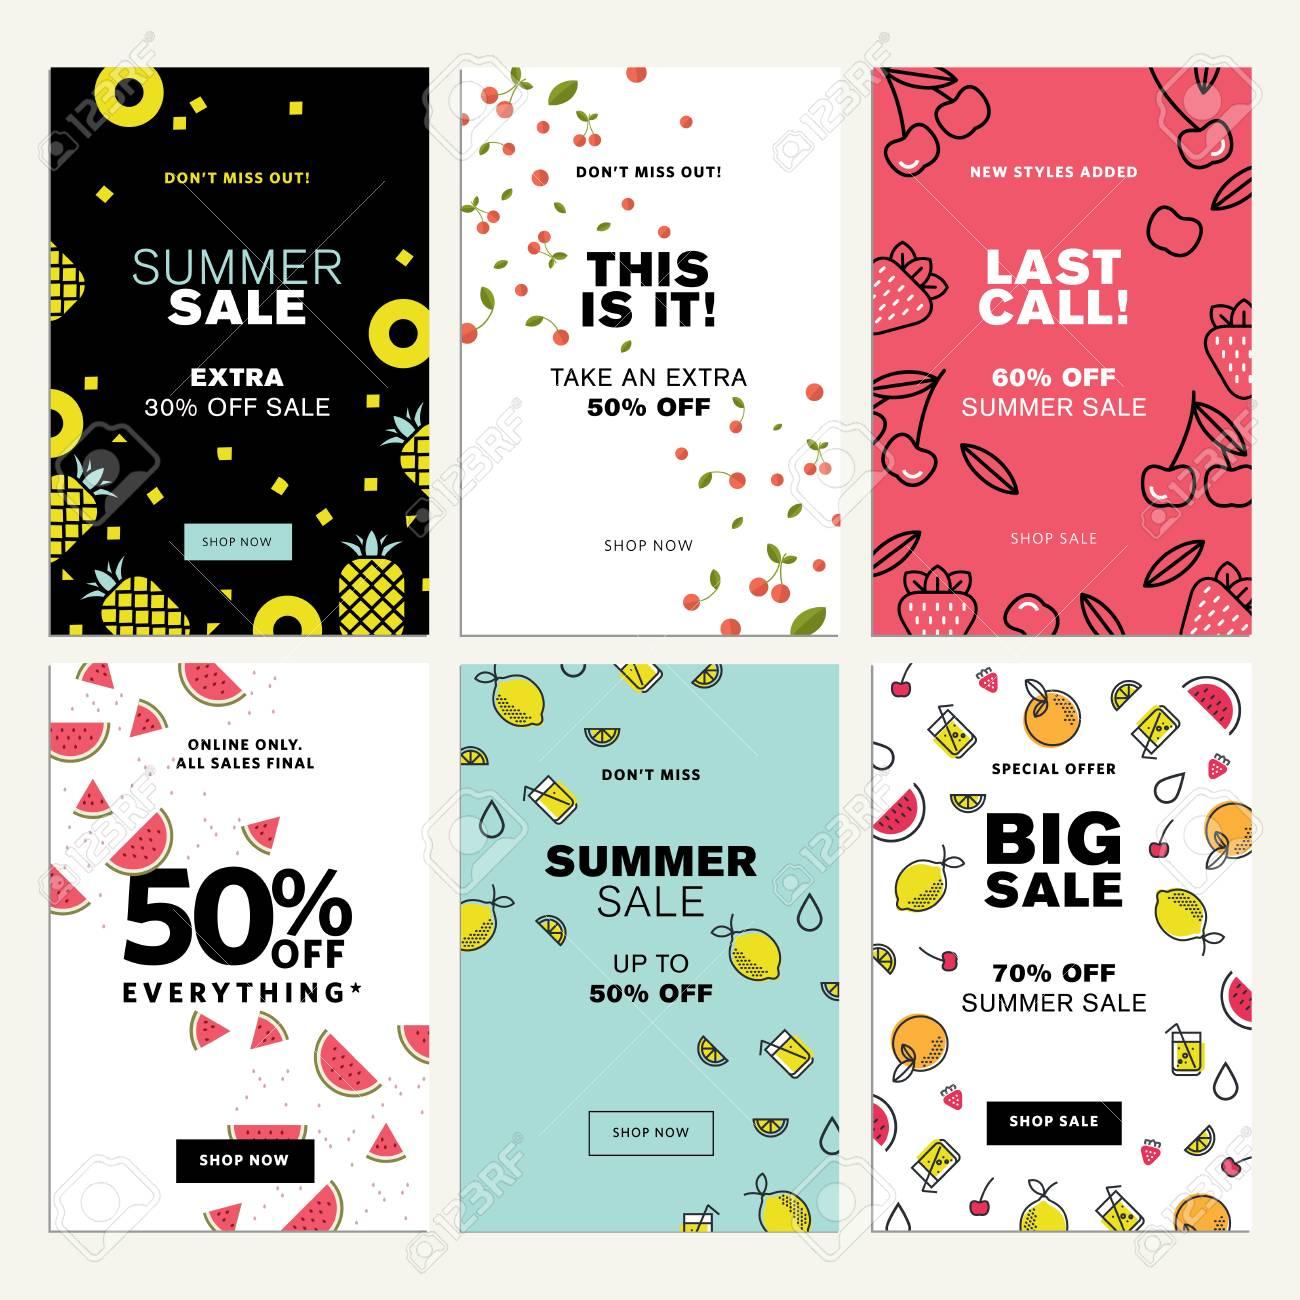 Mobile Sale Banner Templates Vector Illustrations Of Online